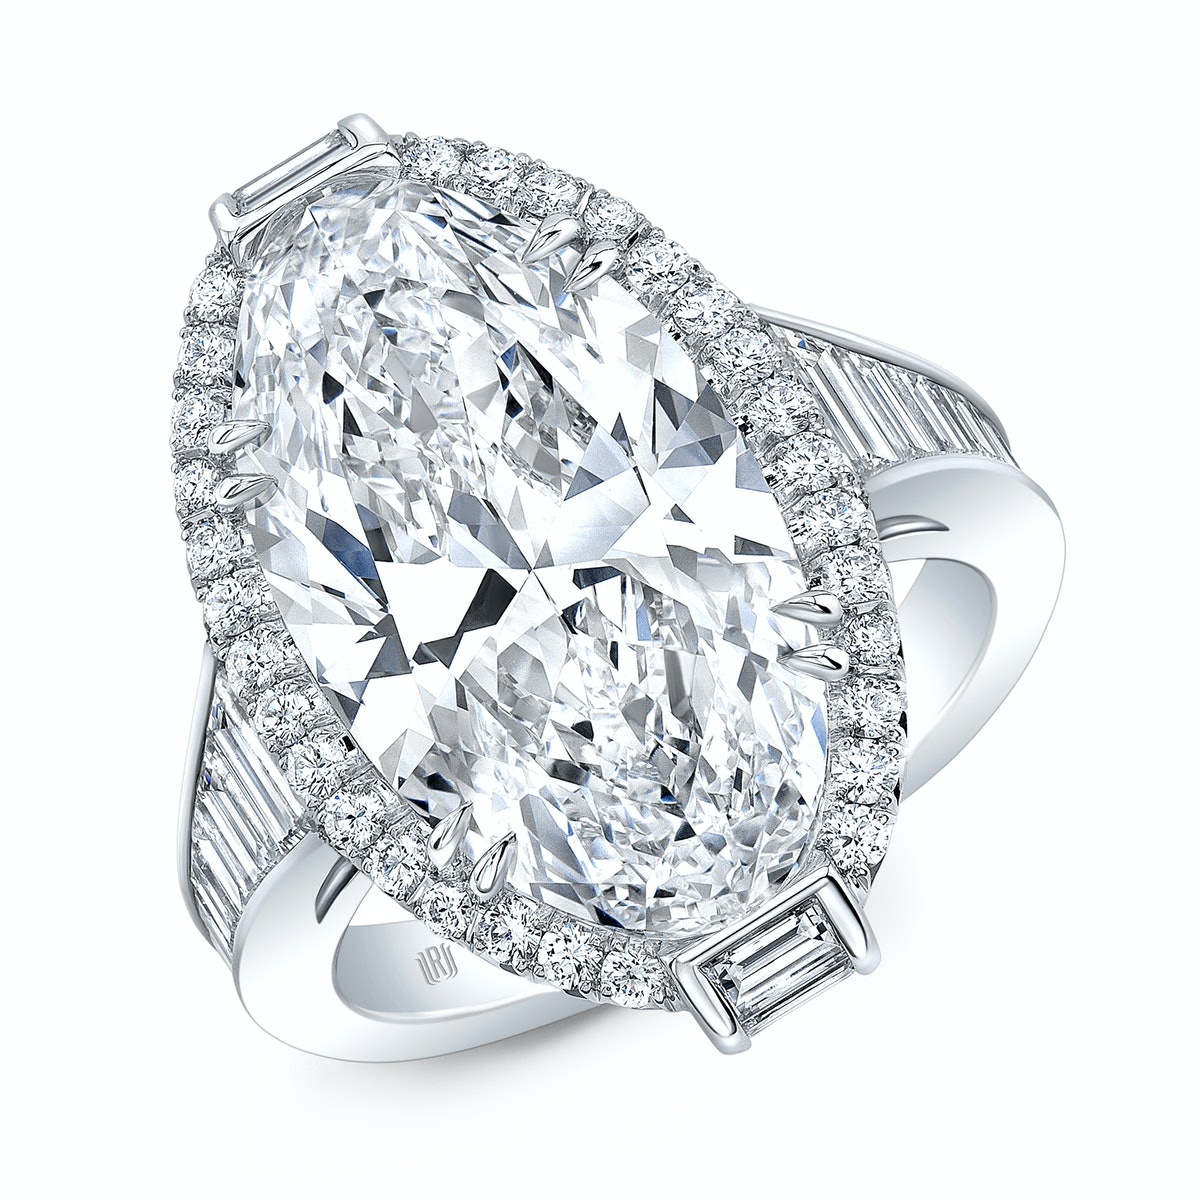 Regina King Golden Globes Jewelry